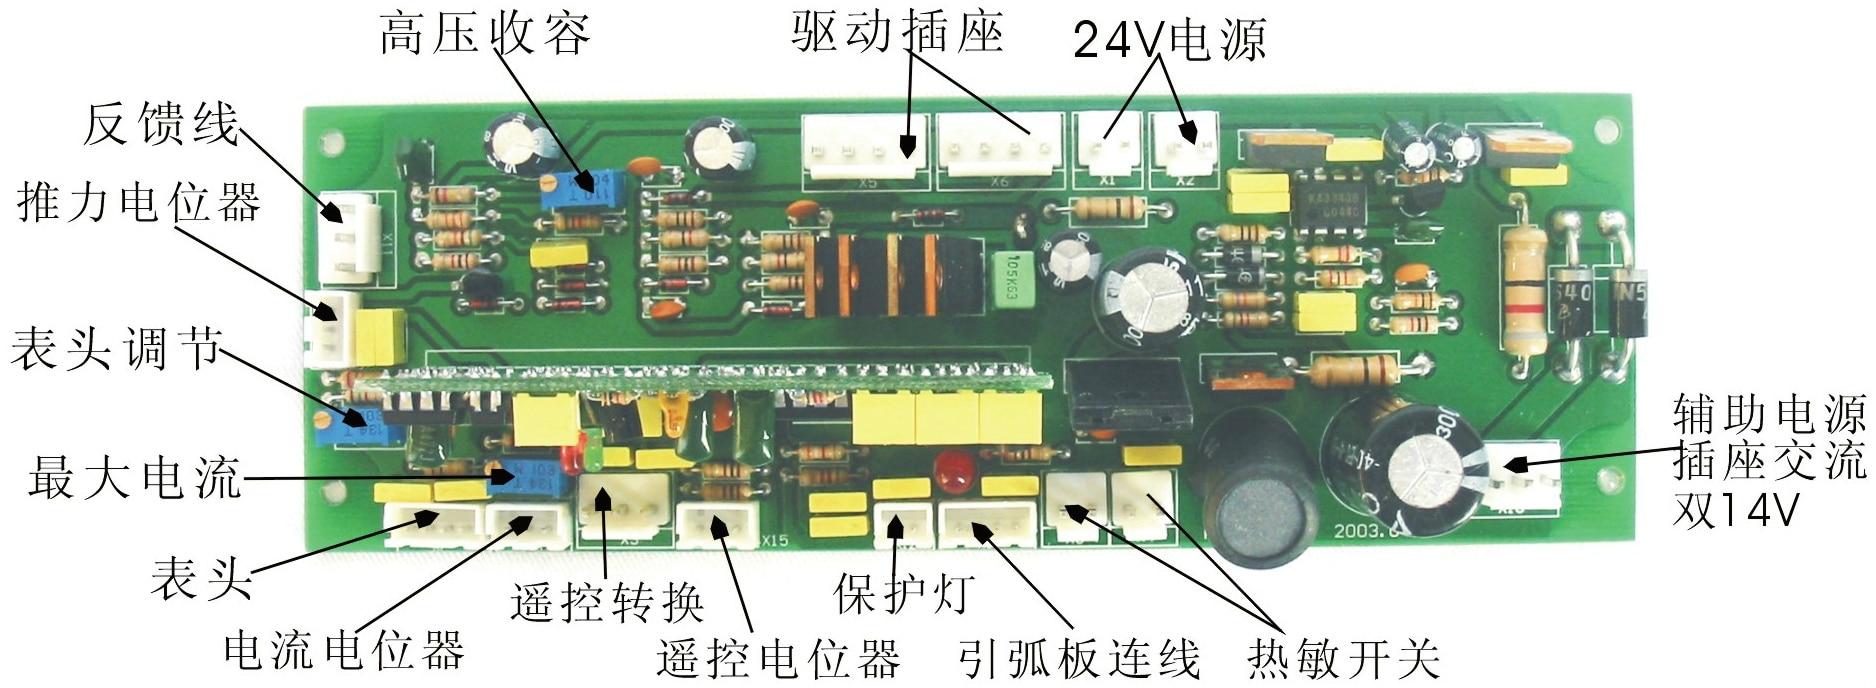 medium resolution of electric welding machine inverter dc manual welding parts zx7 mos inverter welding machine